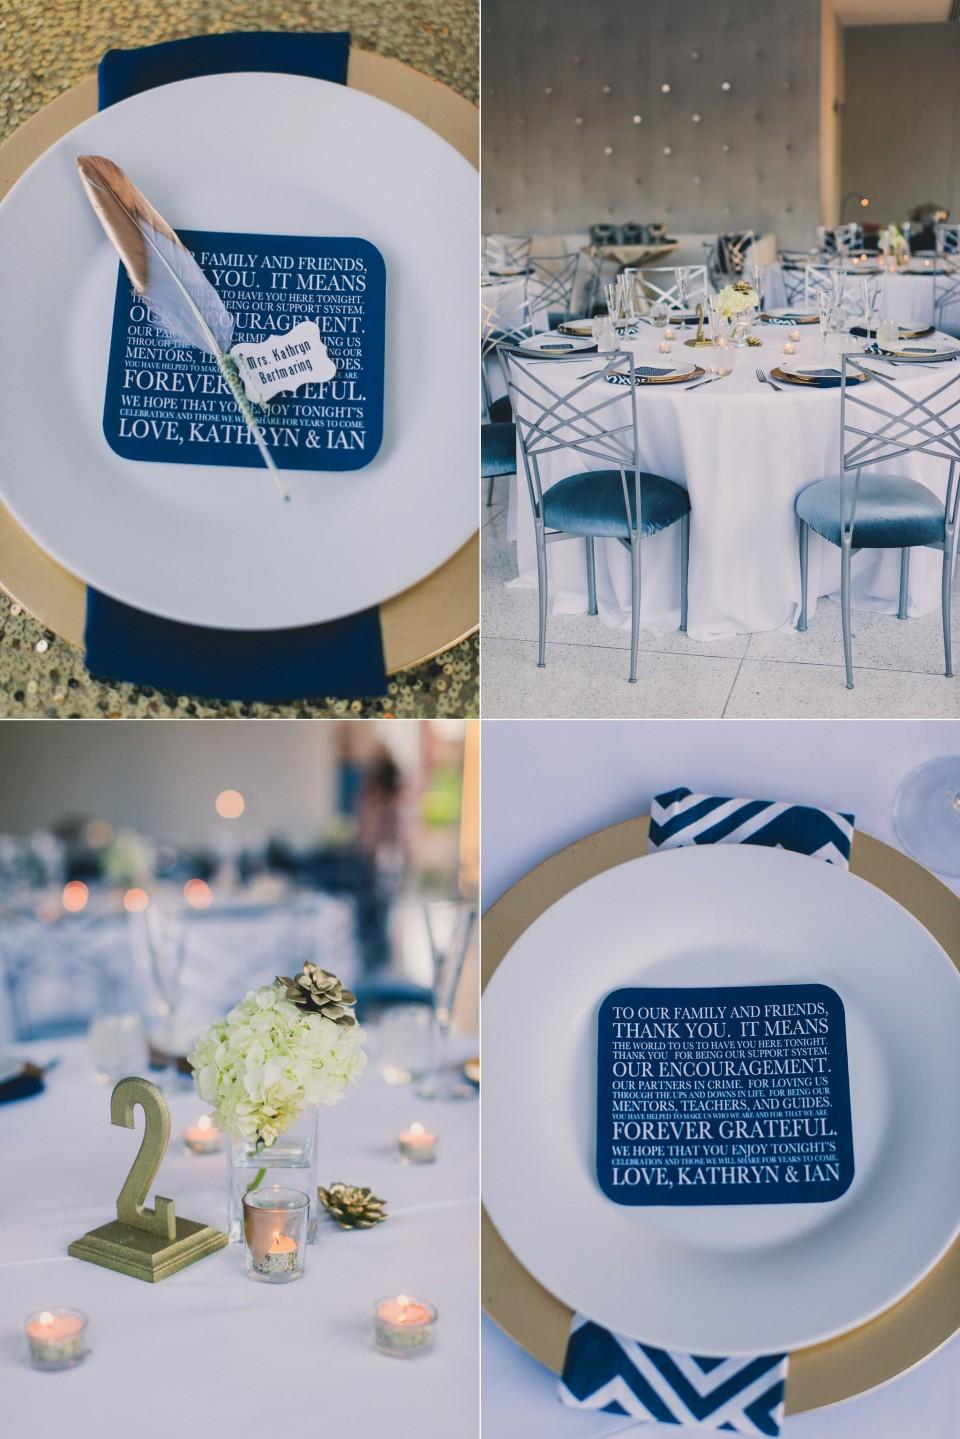 KathrynIan-ClaytonOnThePark-Wedding-138